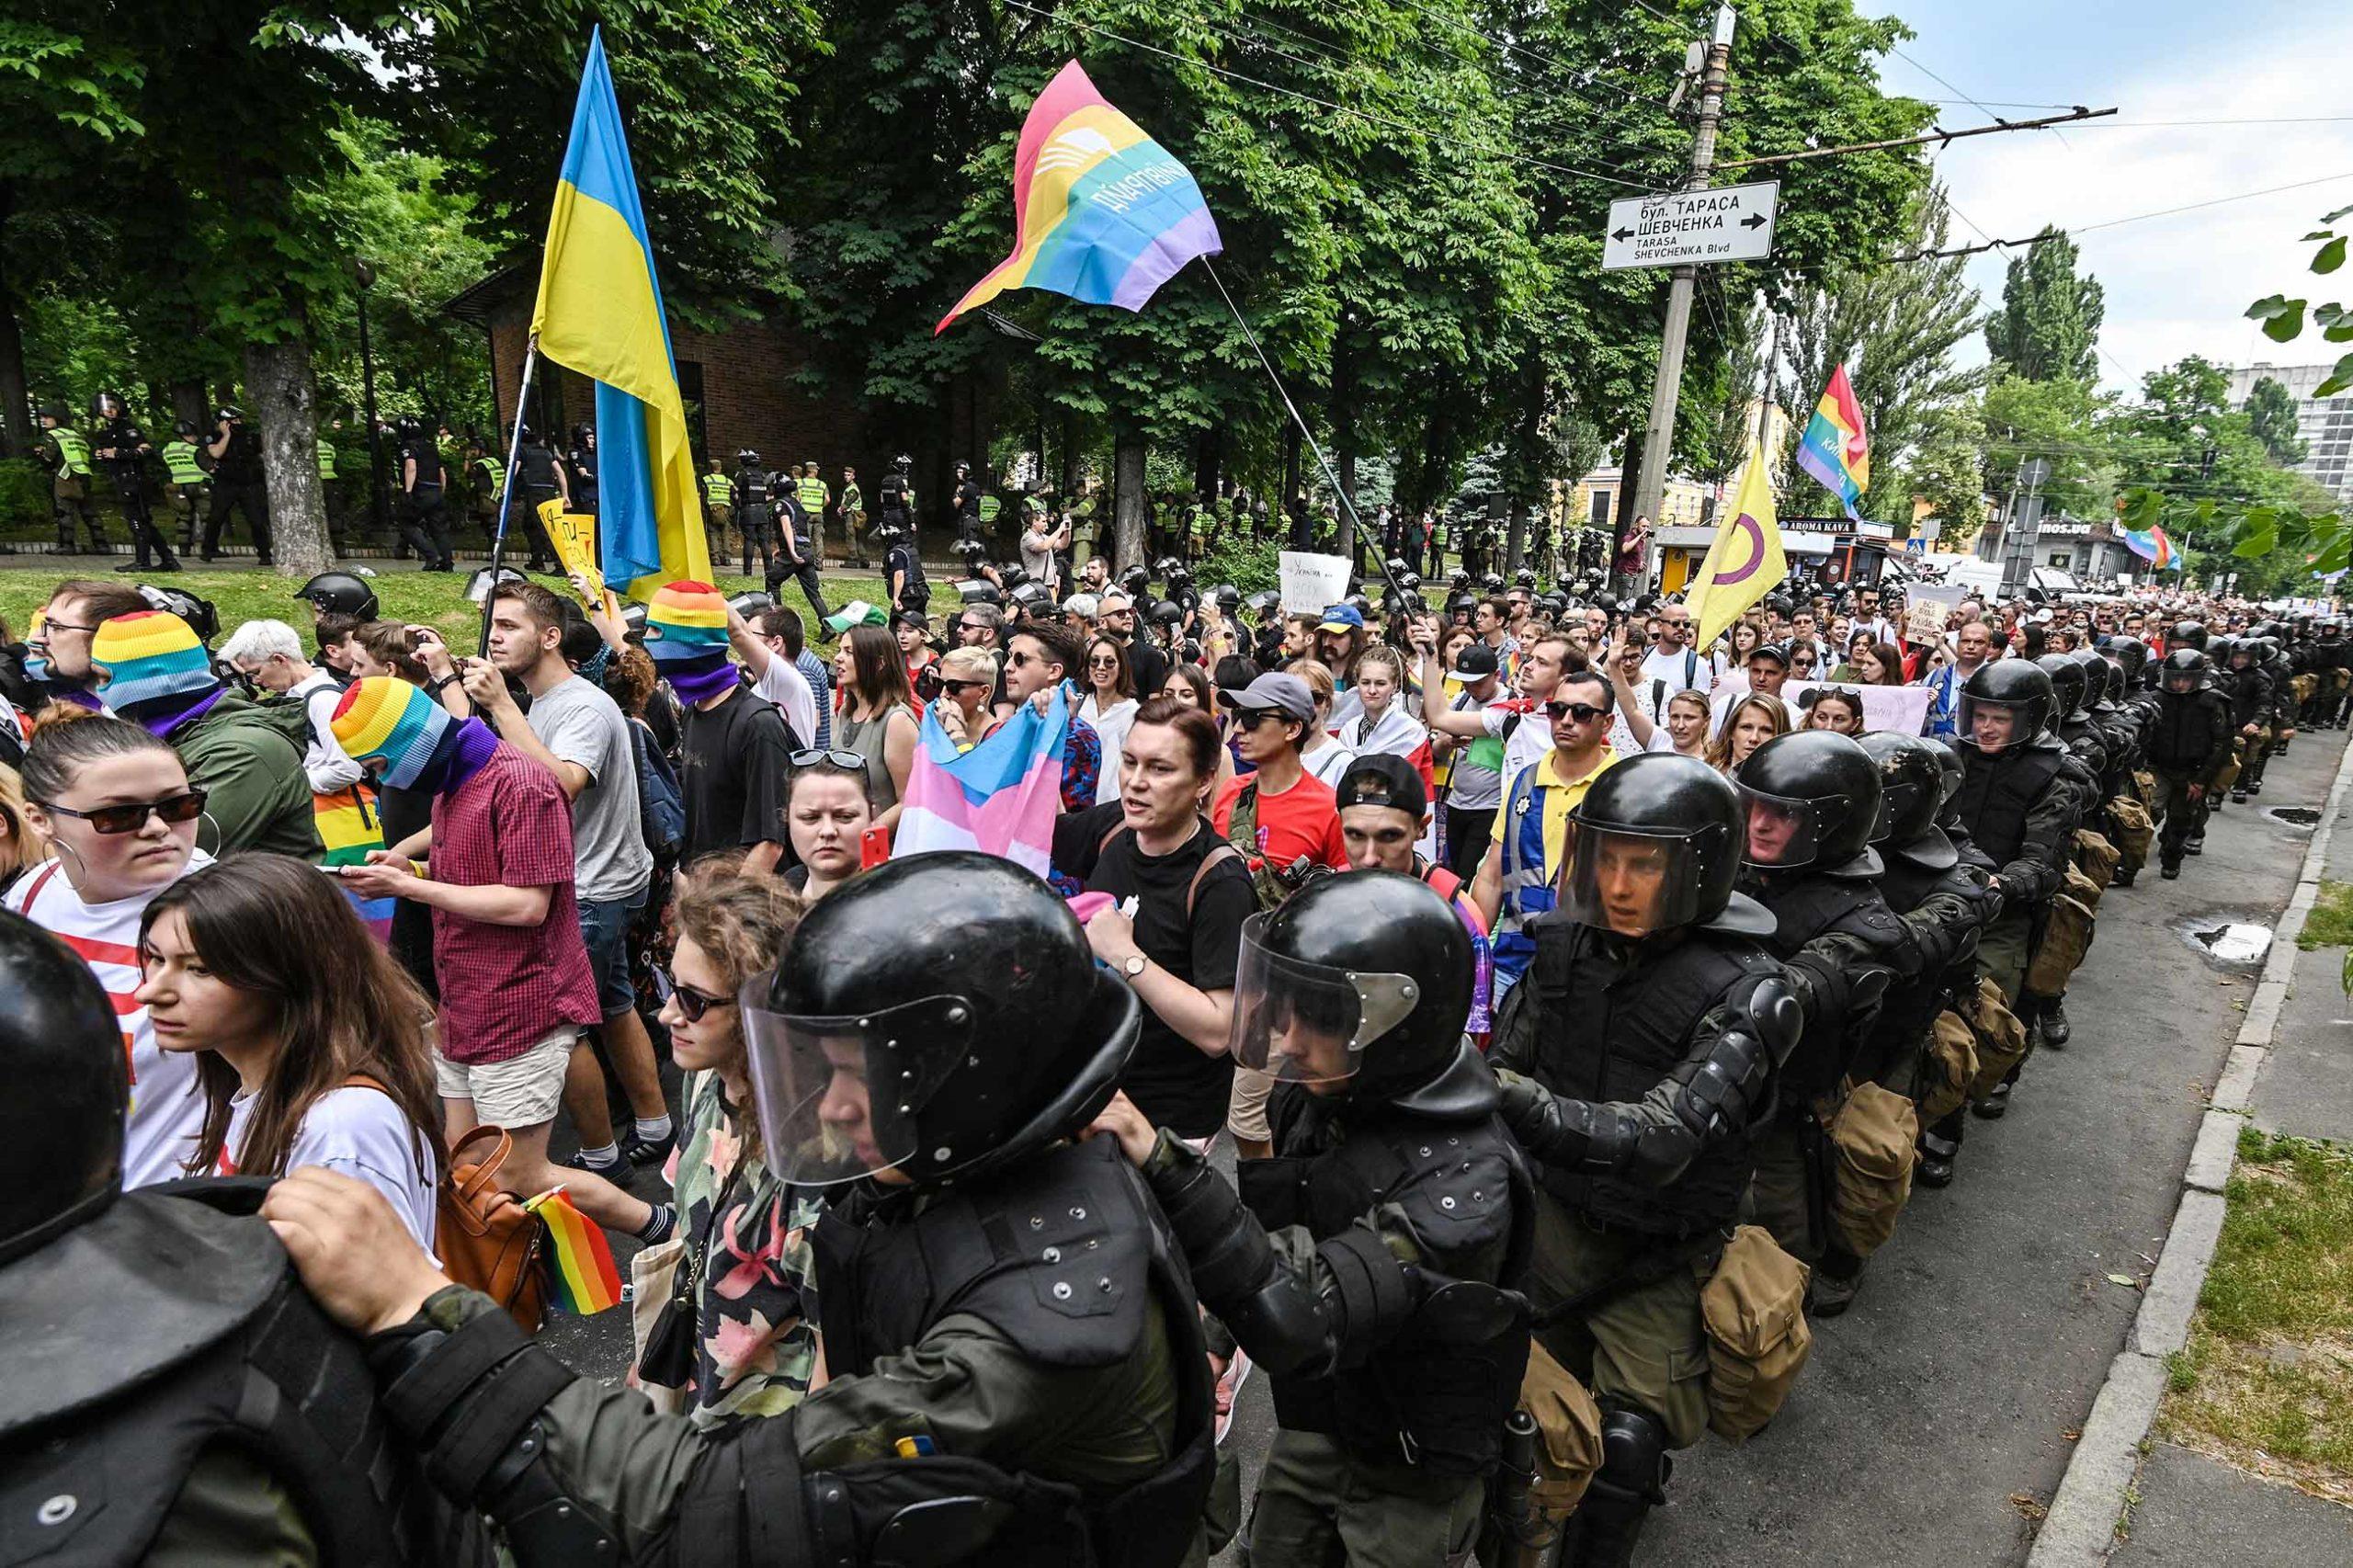 gettyimages 1151578011 scaled - <b>«Донбас-квір».</b> Як активіст із Бахмута дав голос ЛГБТ-спільноті Донбасу - Заборона